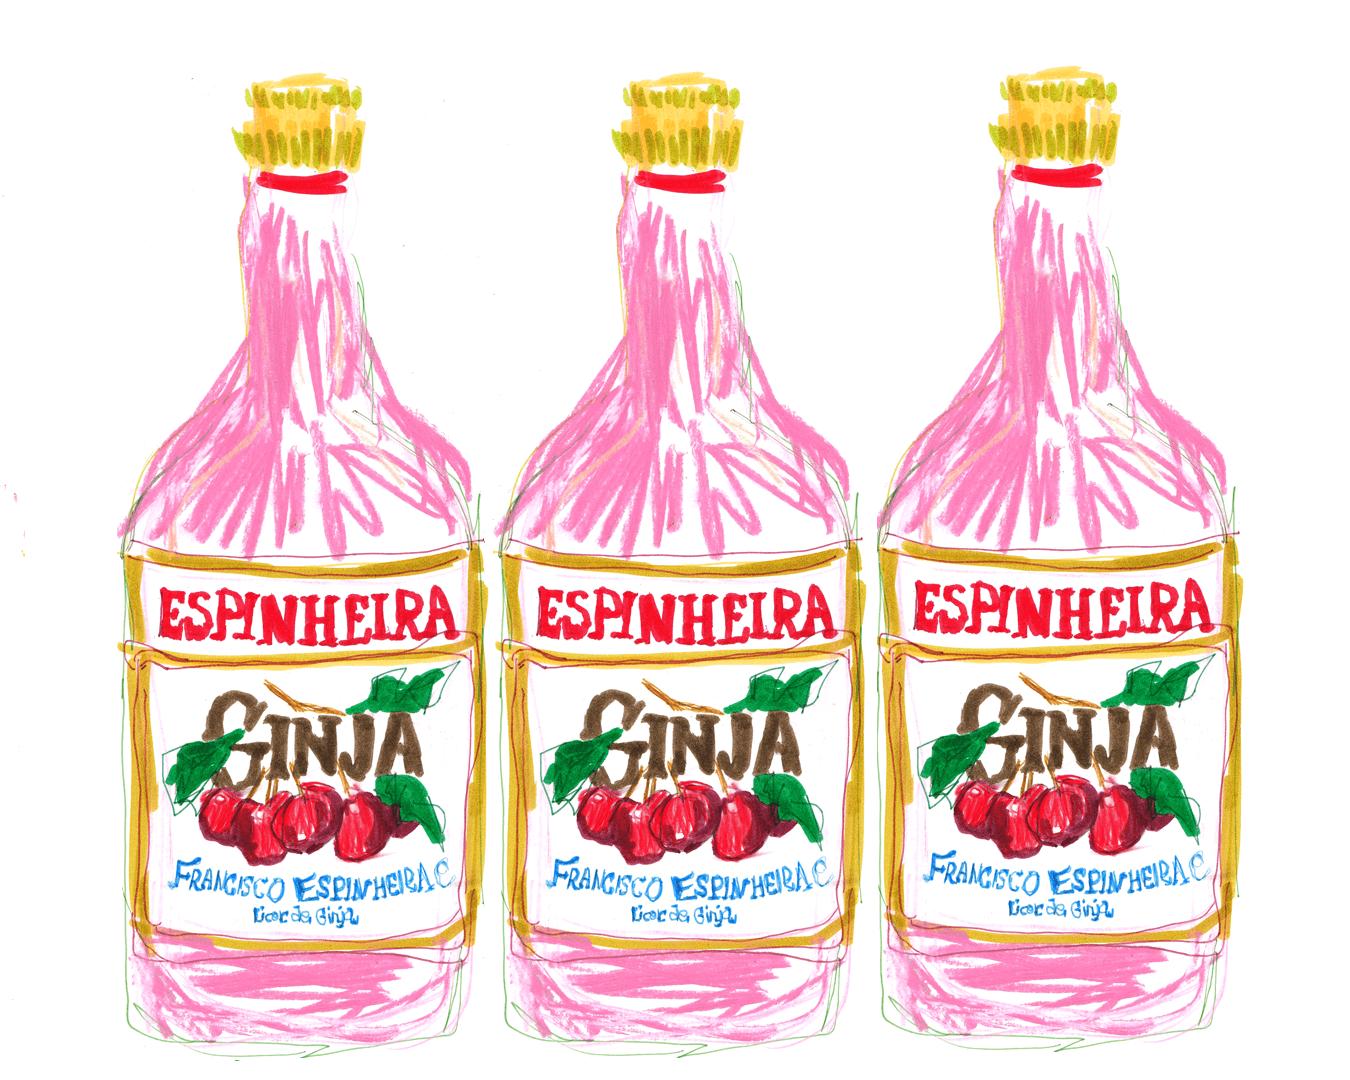 Ginjinha obidos illustration by Mairead Finlay